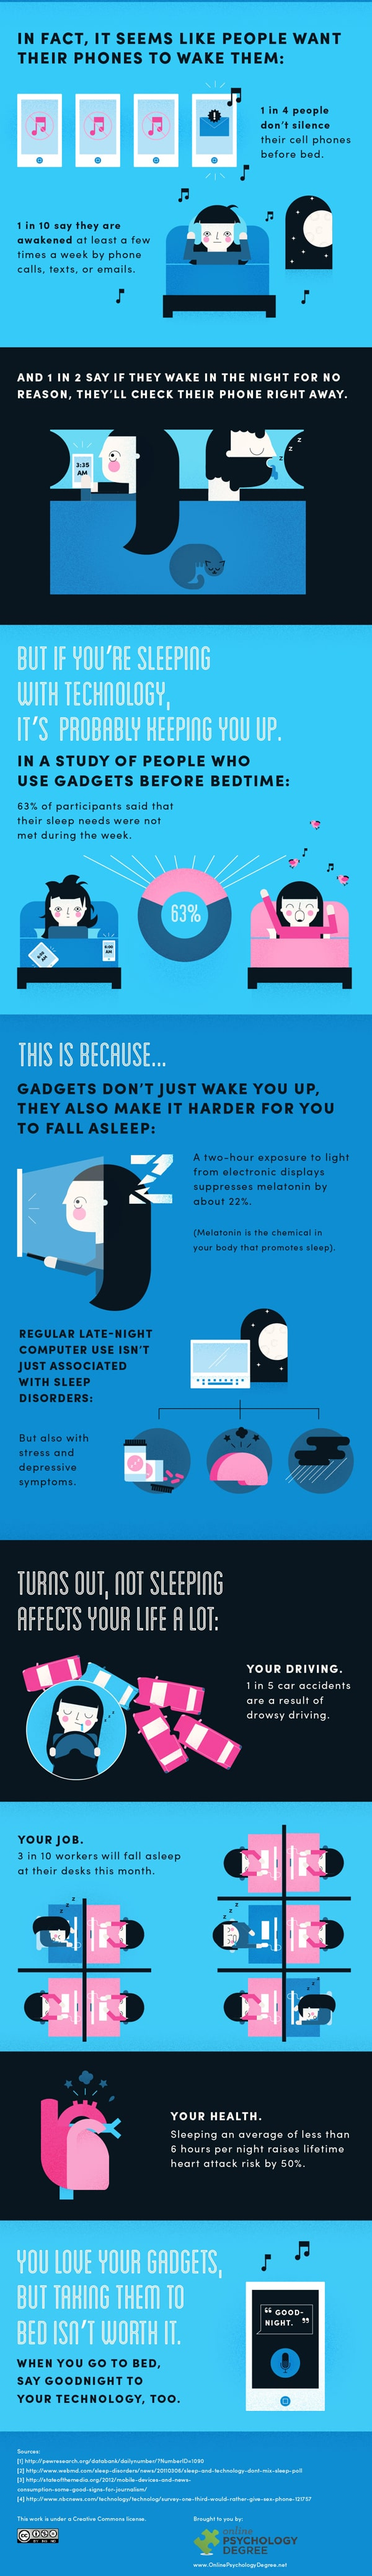 Usage des smartphone au lit 2